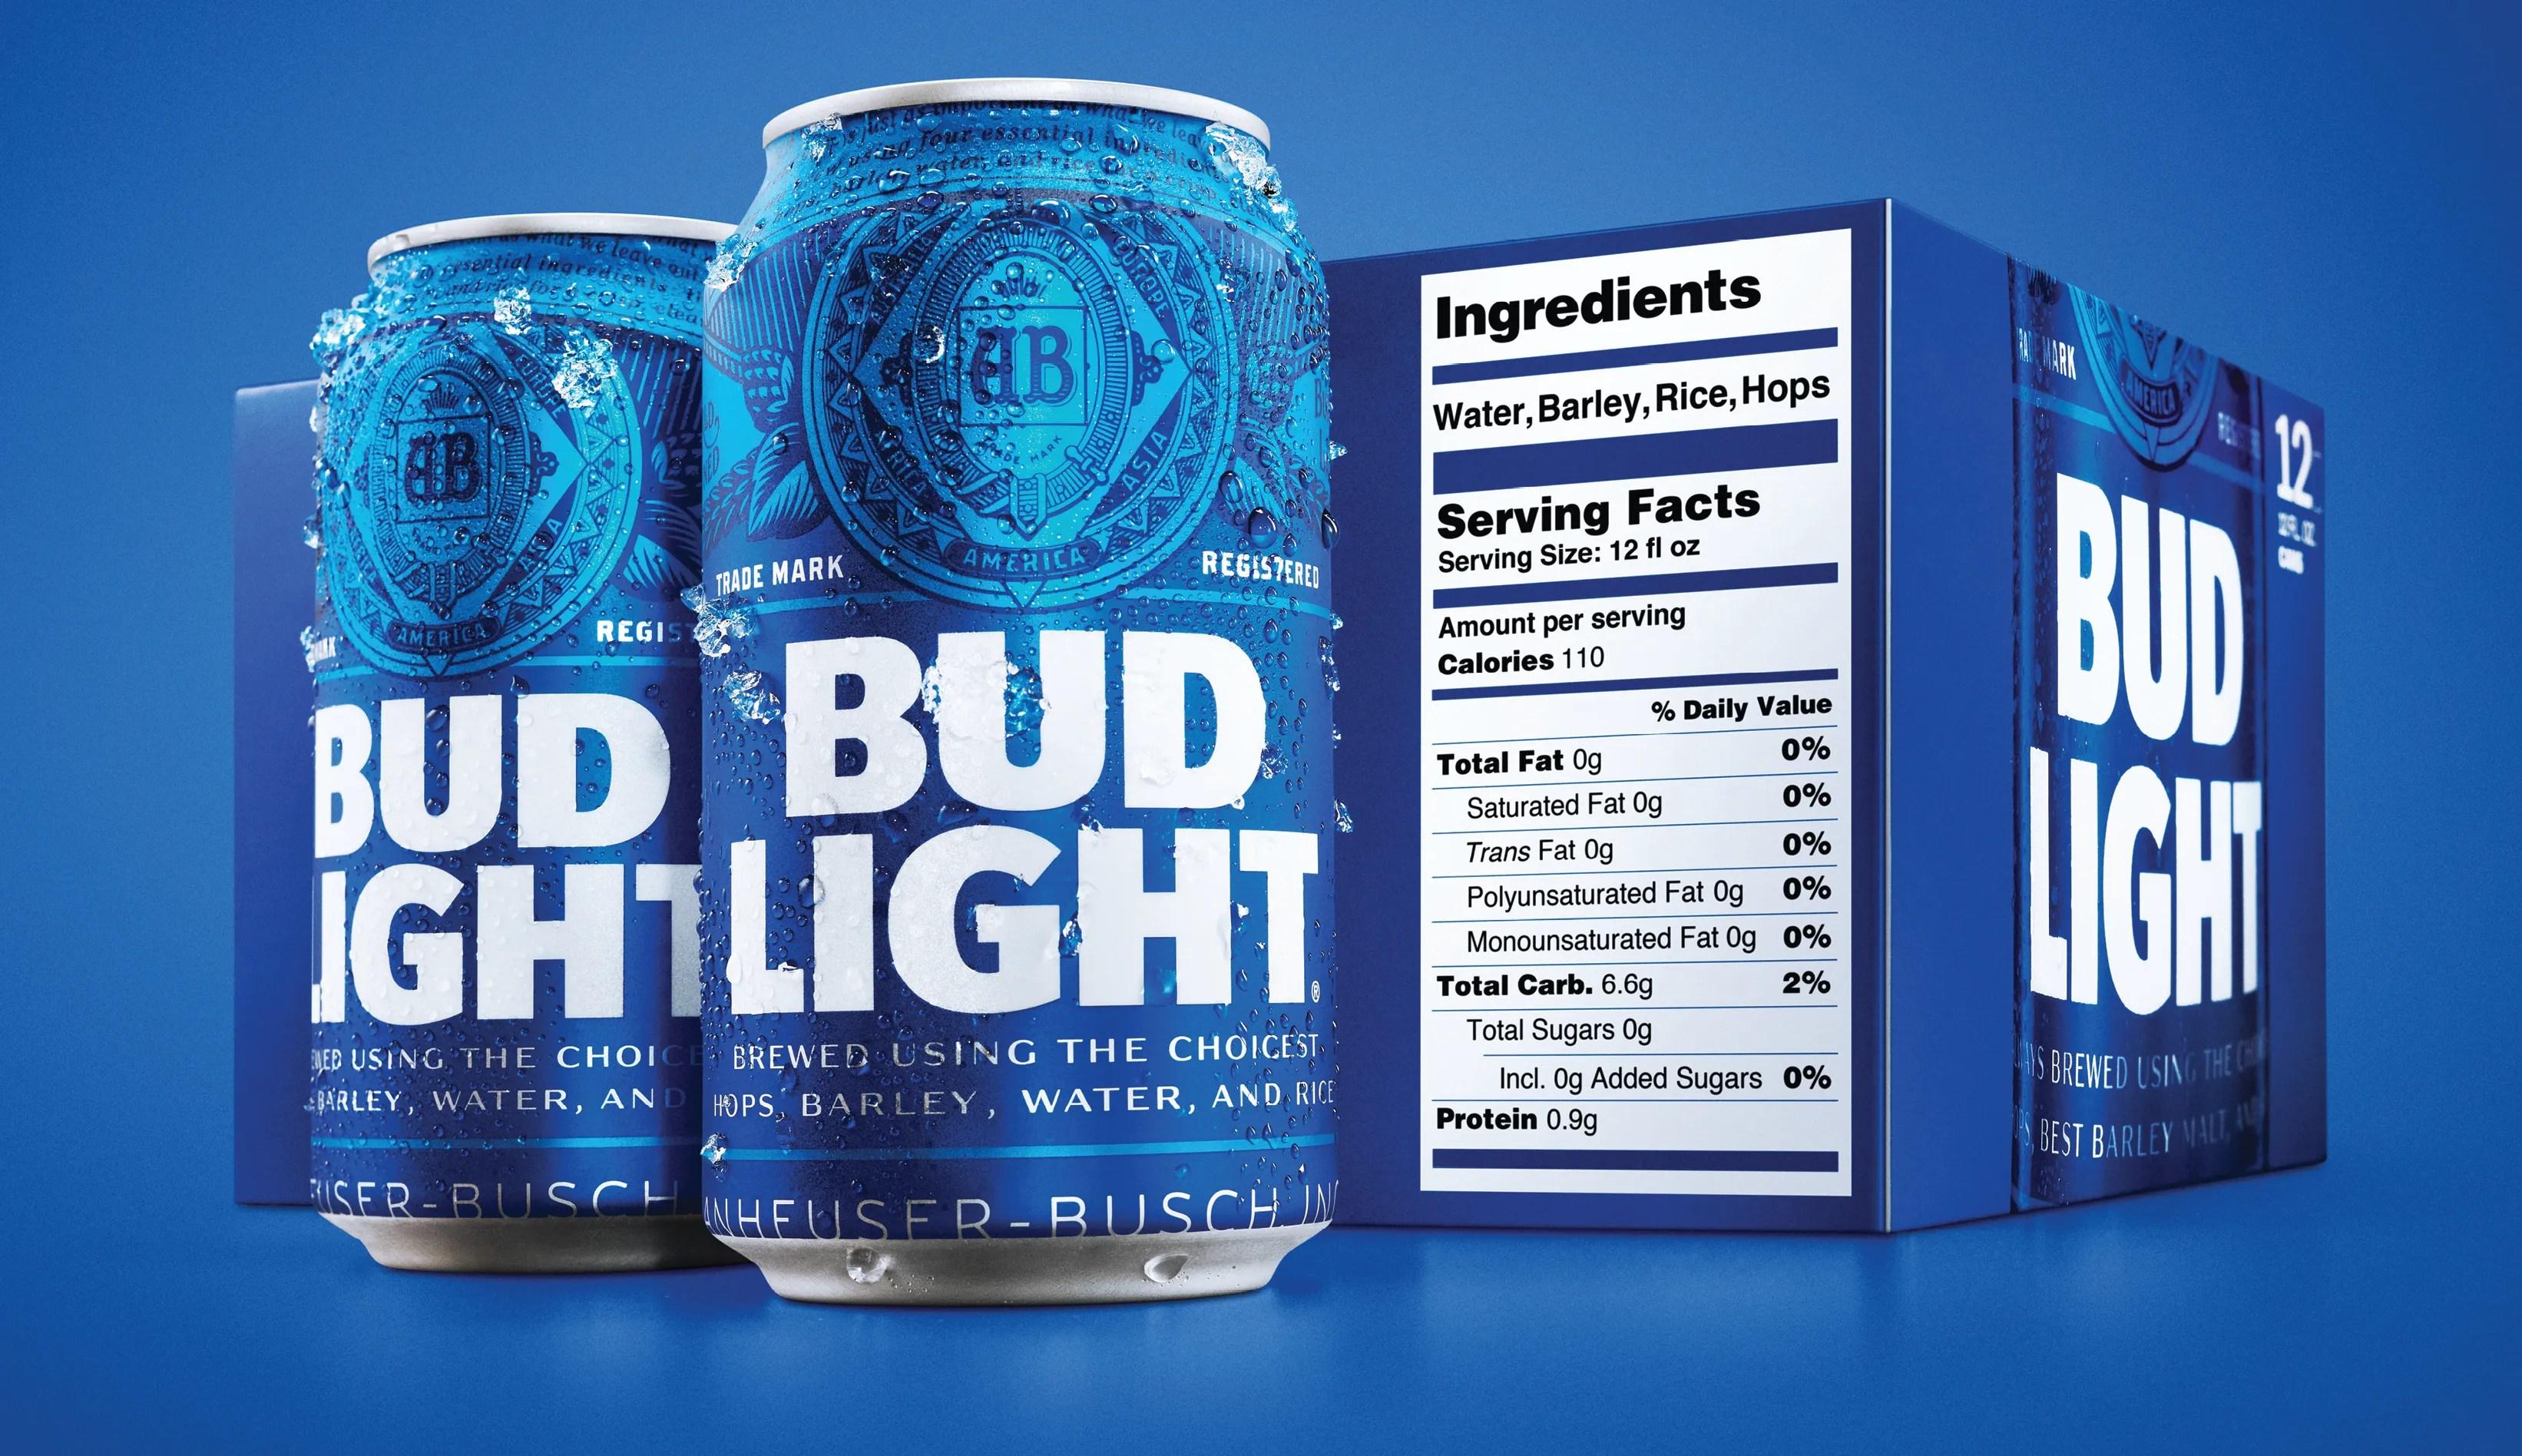 Miller Light Alcohol Content